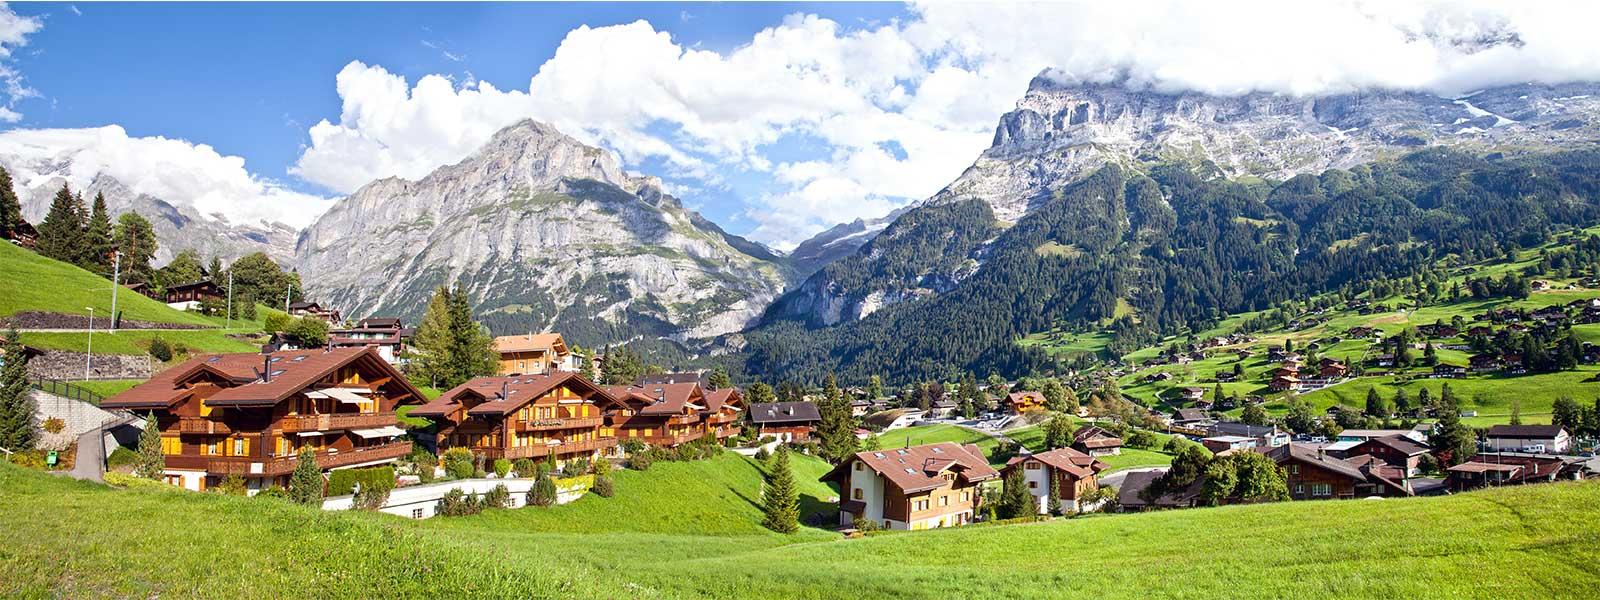 village_grindelwald.jpg